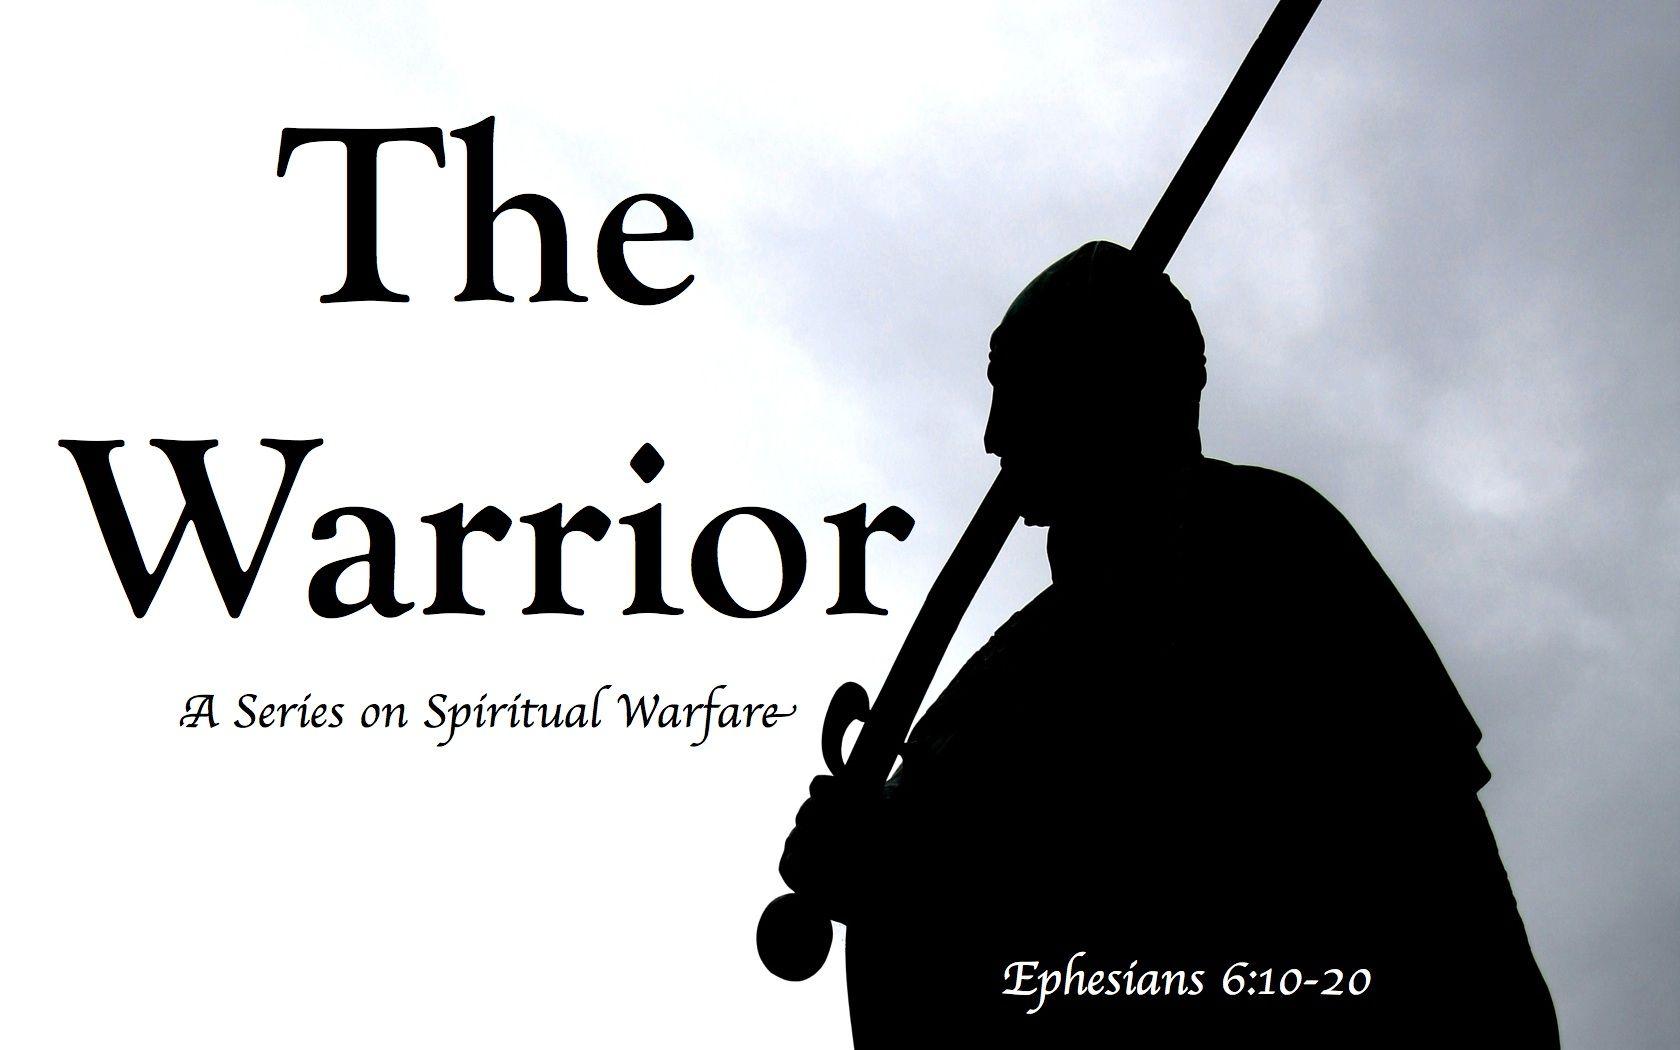 Ephesians 6:10-20 | Spiritual warfare. Ephesians